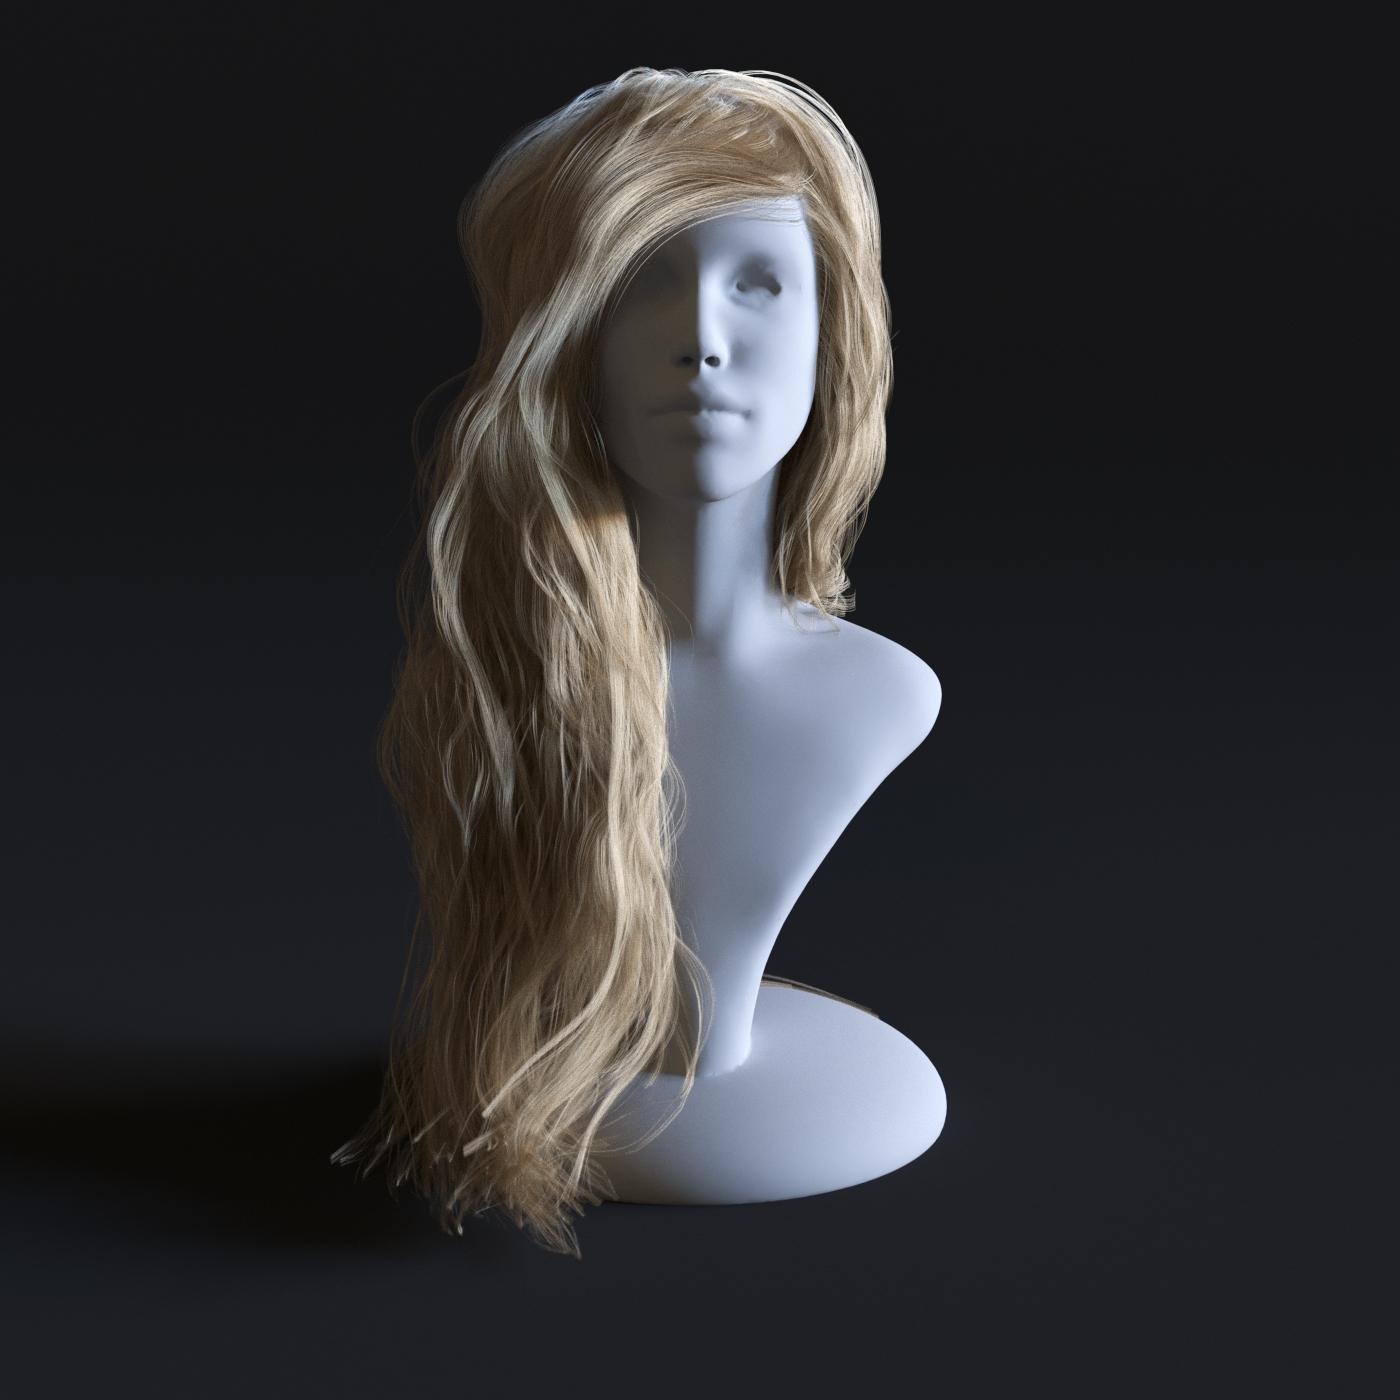 0310_Hair_Material_09_Blond